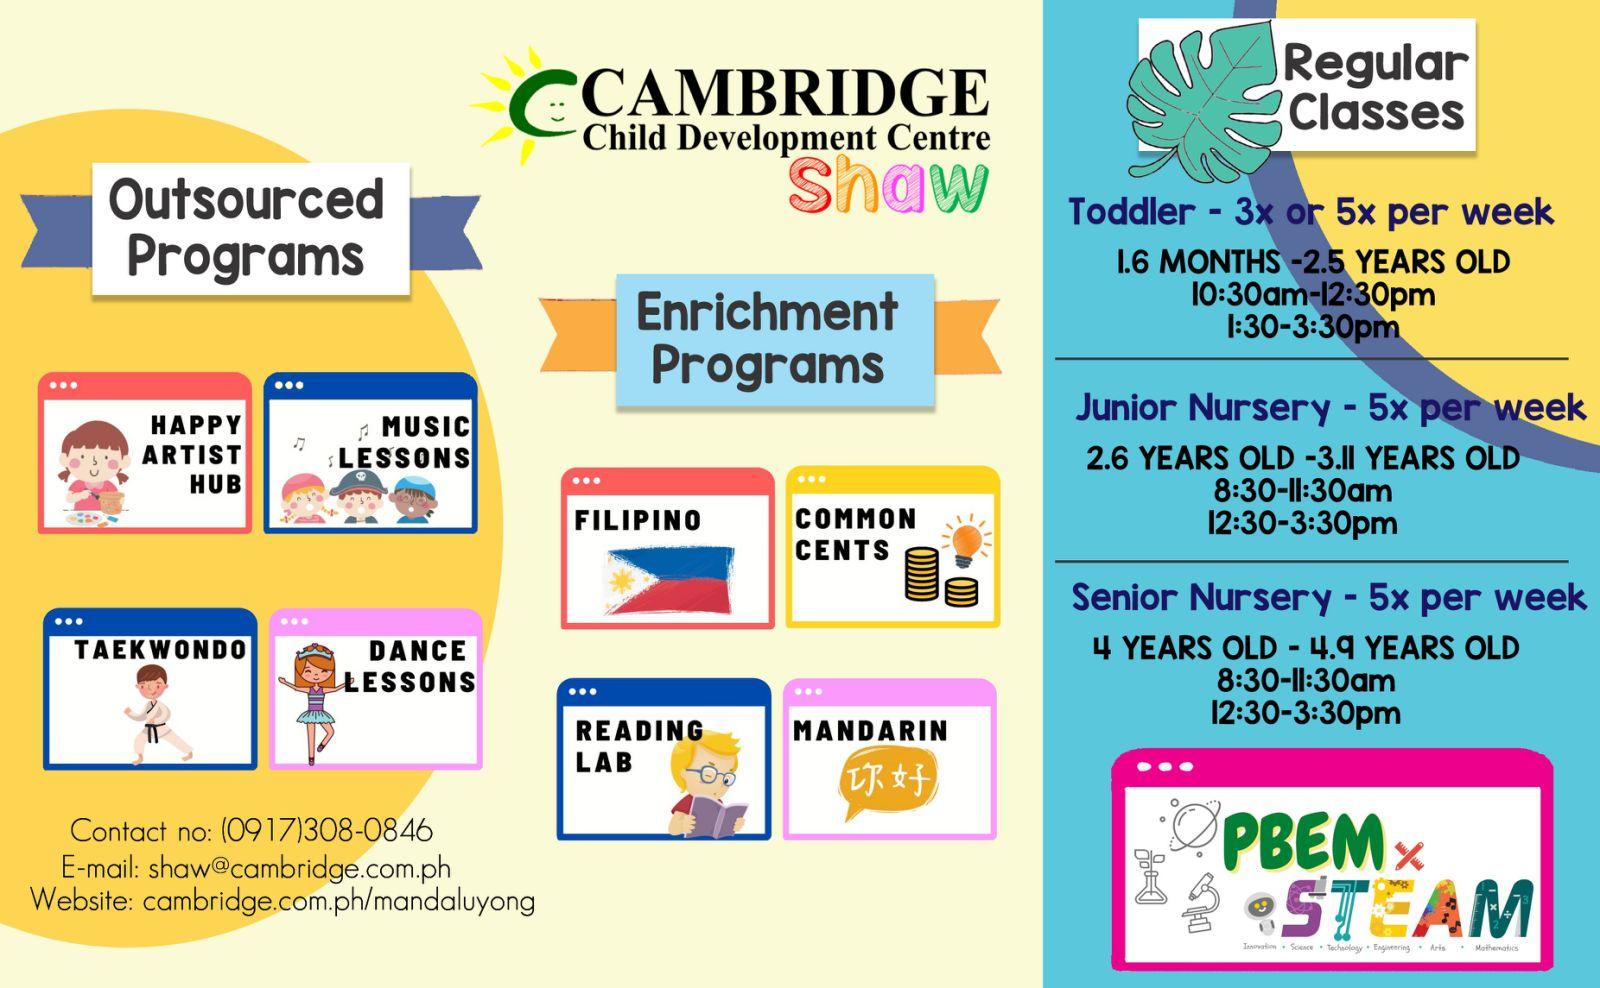 Cambridge Child Development Centre Shaw - Program Offerings